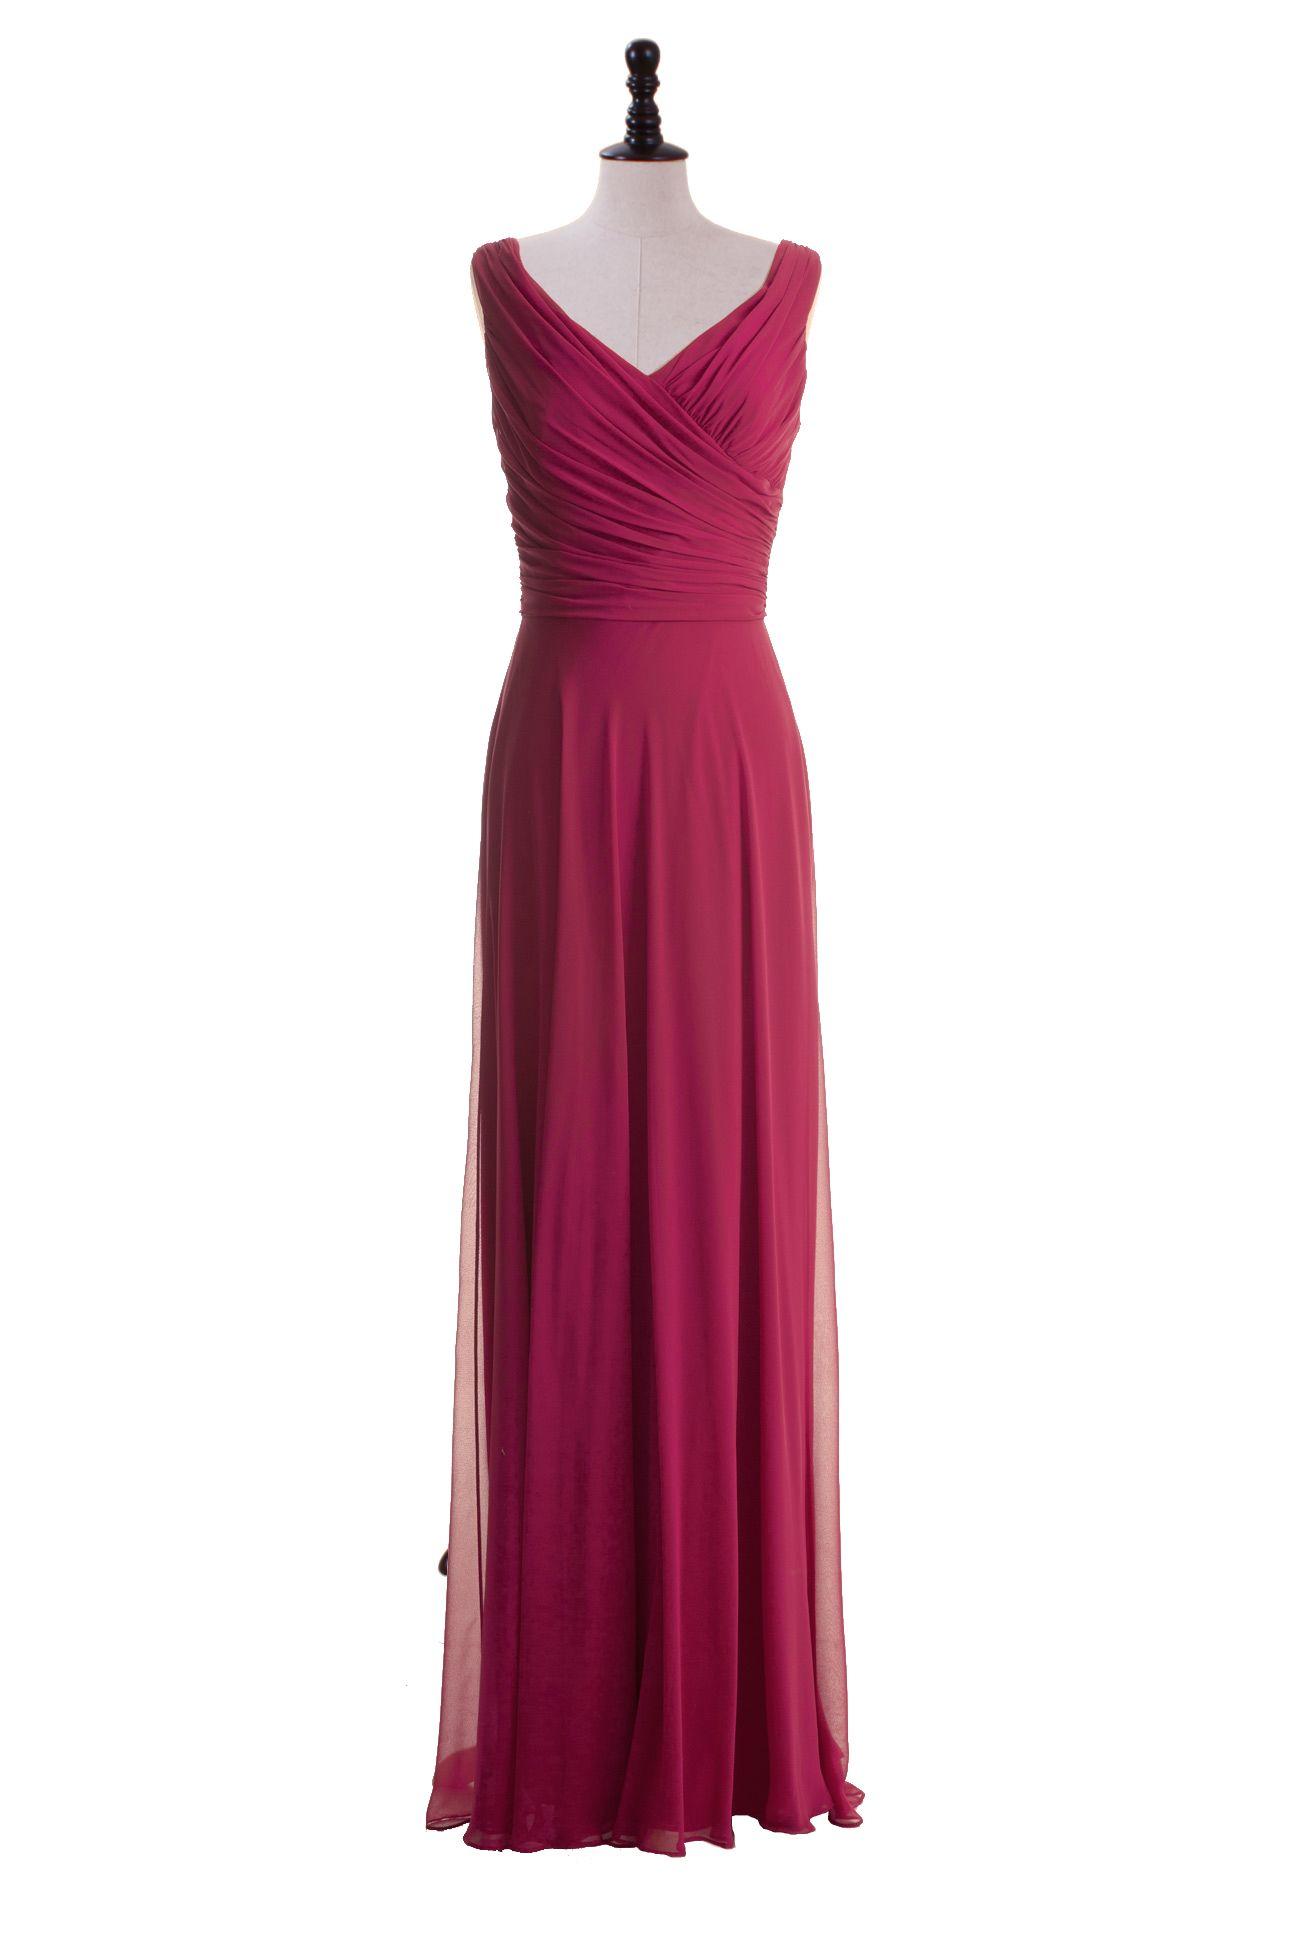 Simple Floor Length V-Neck Chiffon Gown  Chiffon, Vestiti, Abiti